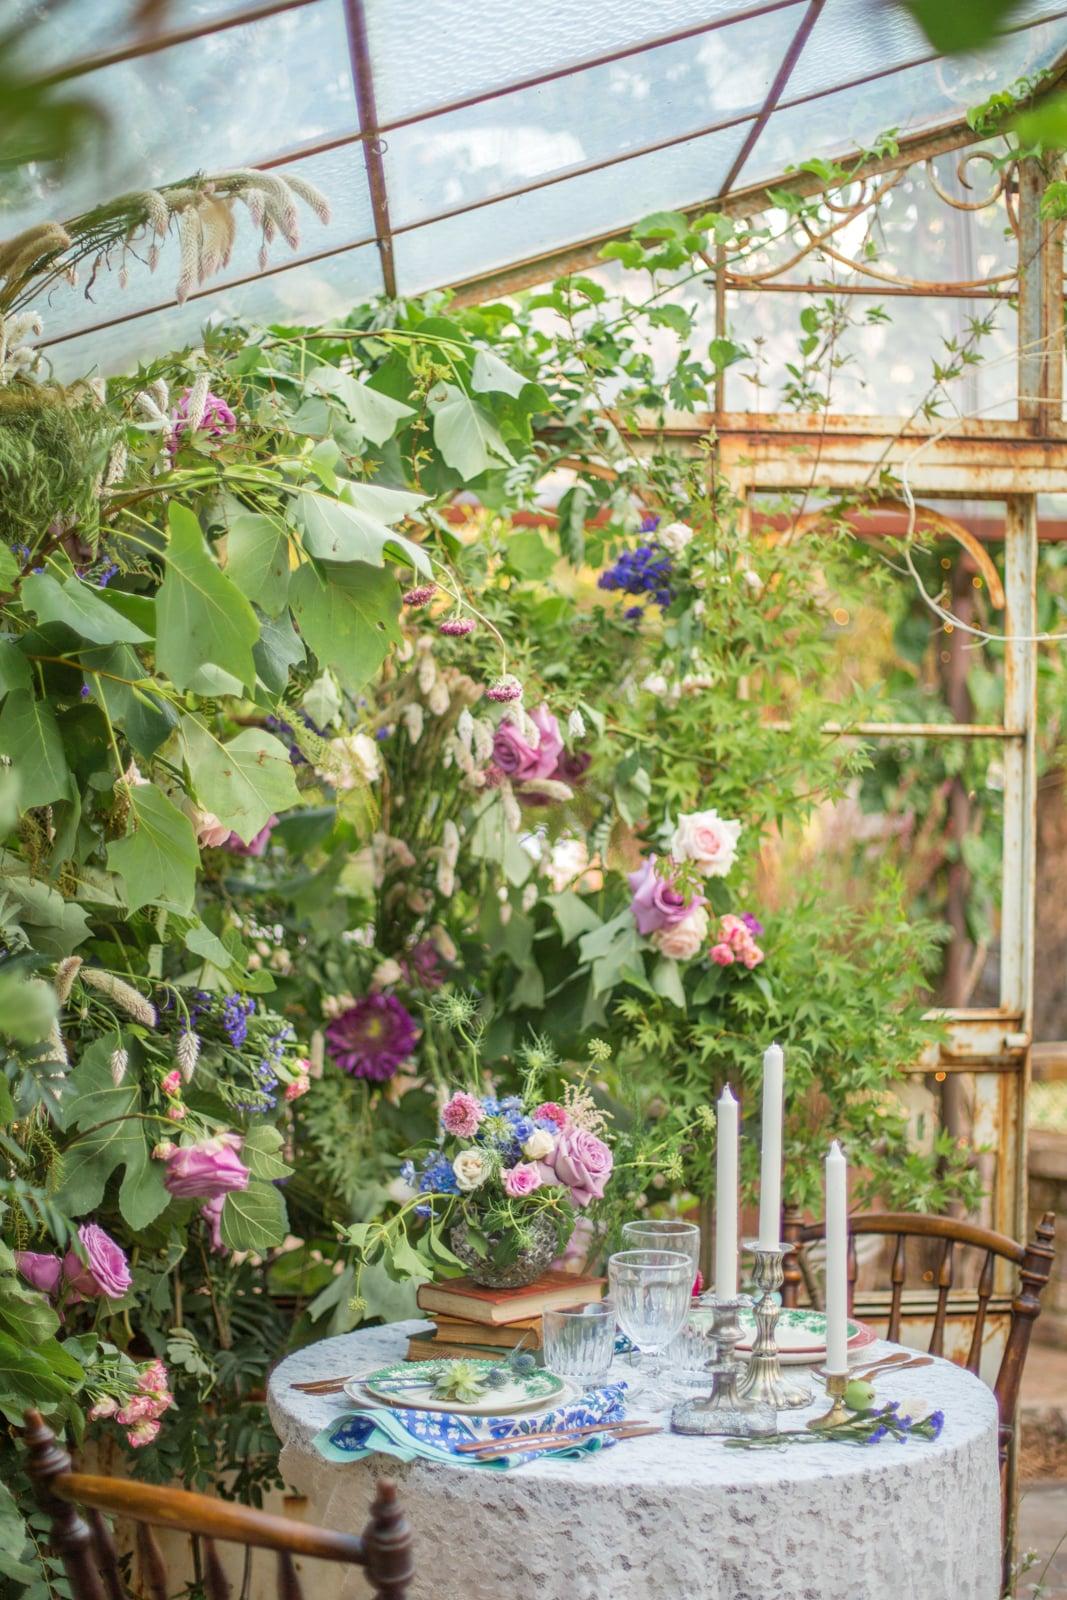 How To Make Cut Flowers In A Vase Lase Popsugar Australia Smart Living